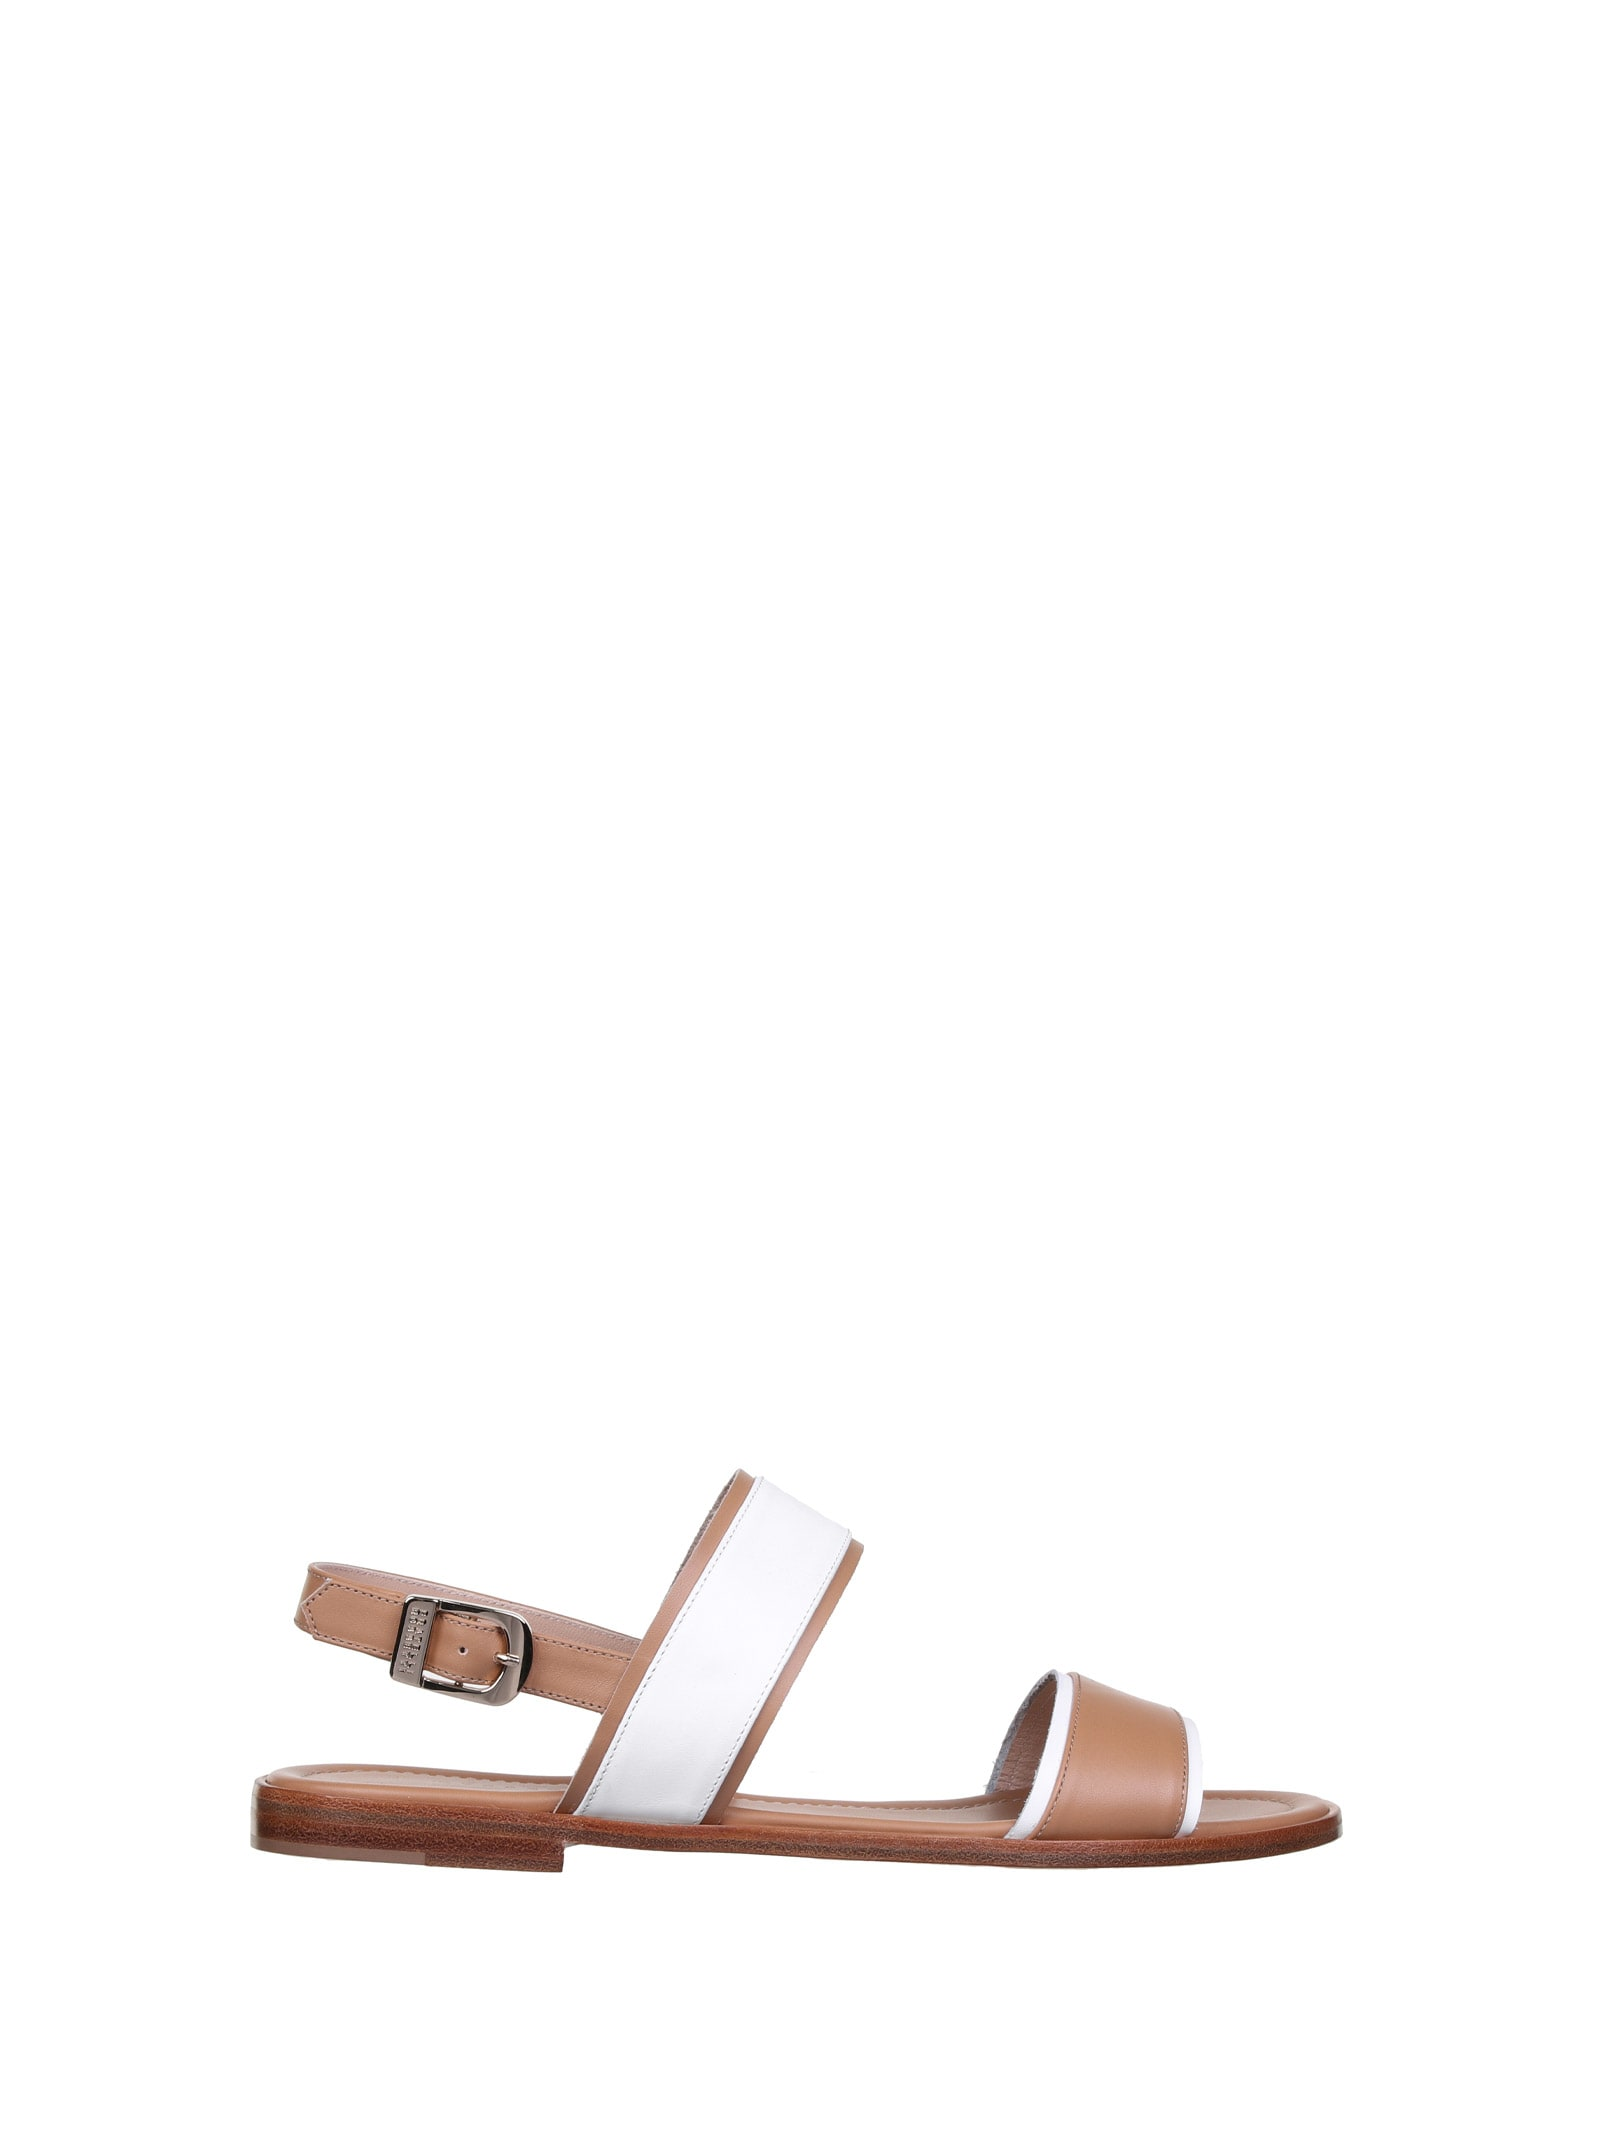 Fratelli Rossetti Fratelli Rossetti Two Tone Sandals